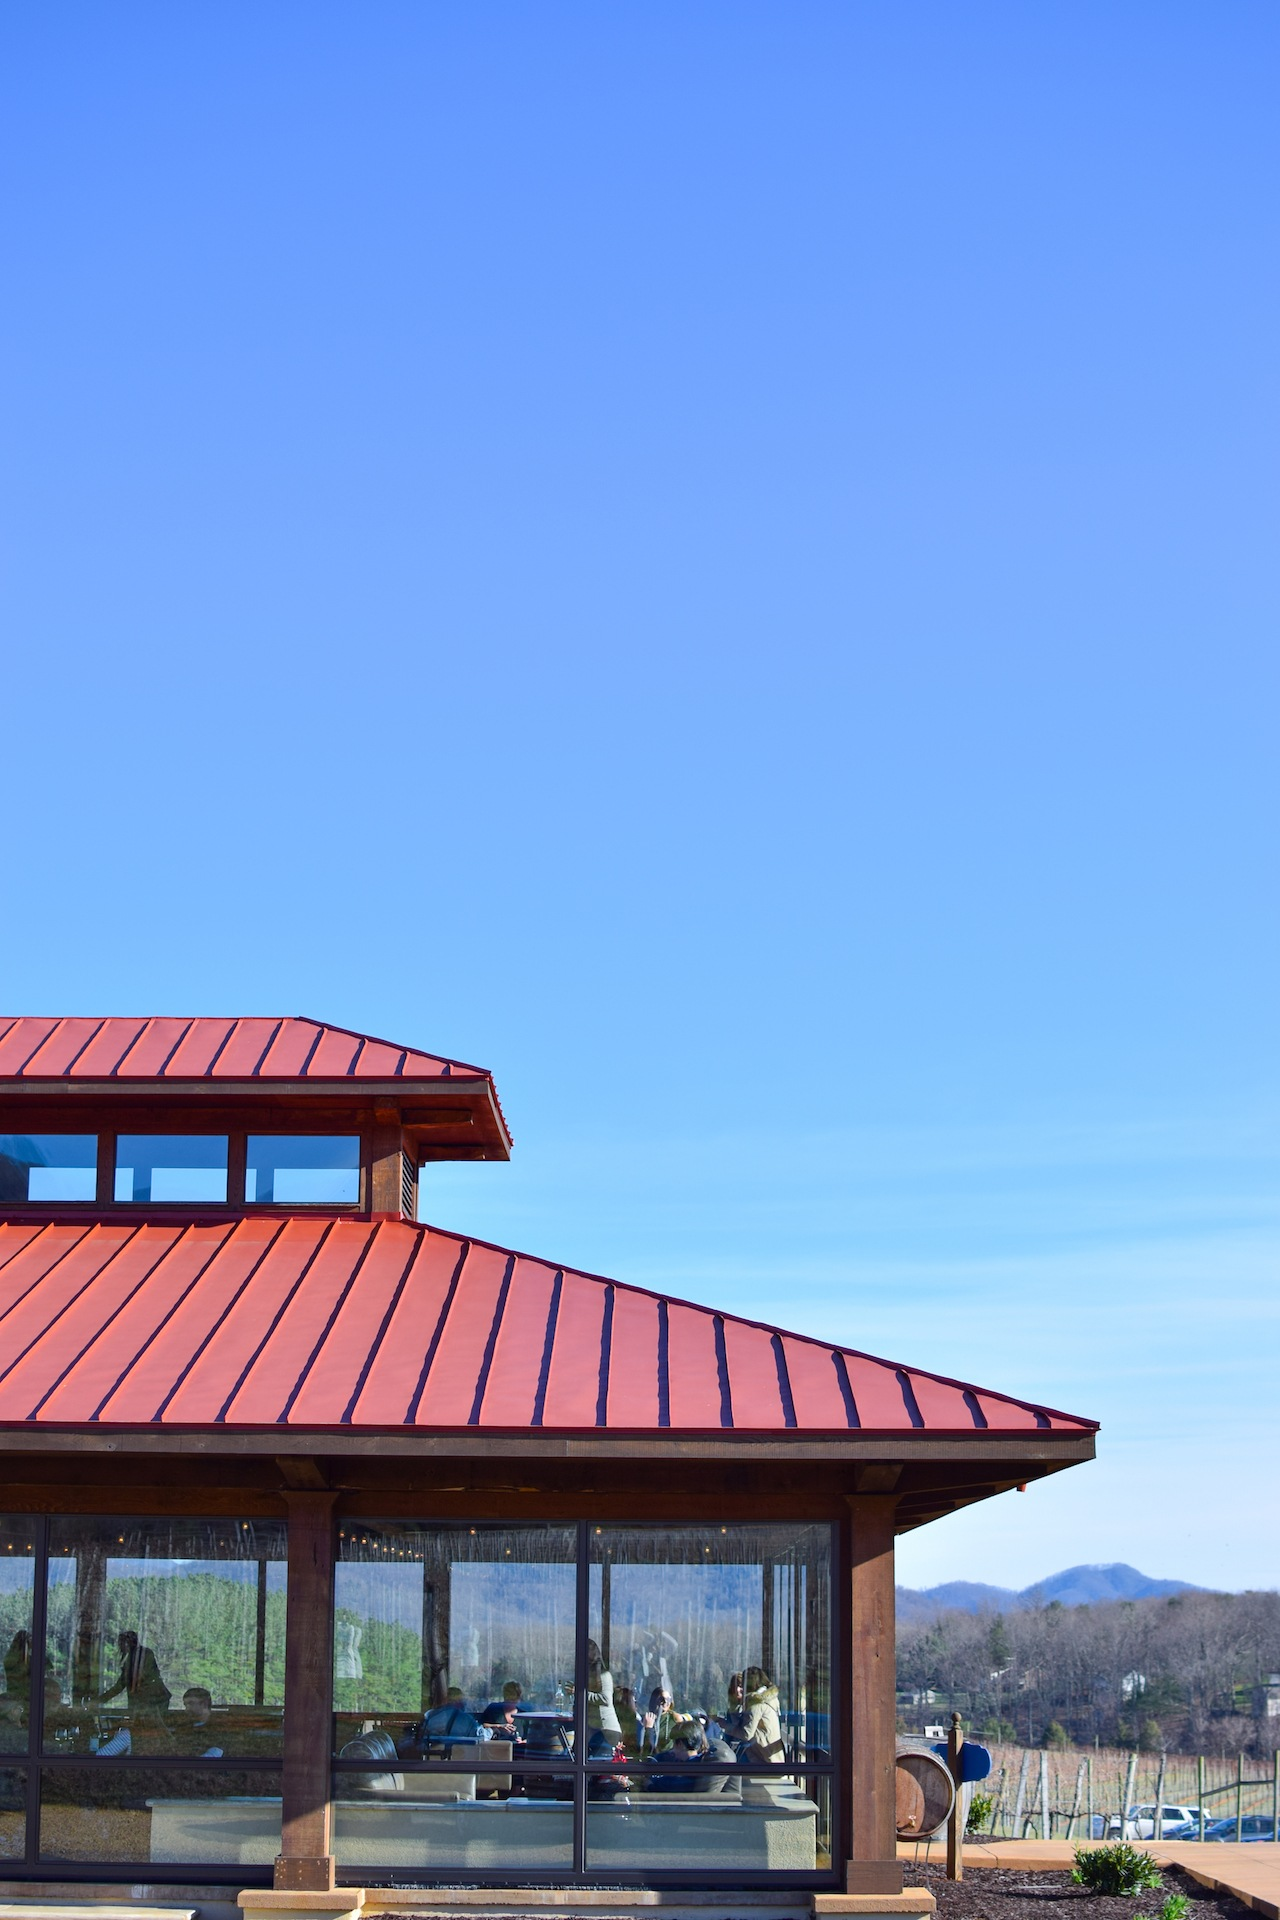 acton mountain vineyards review